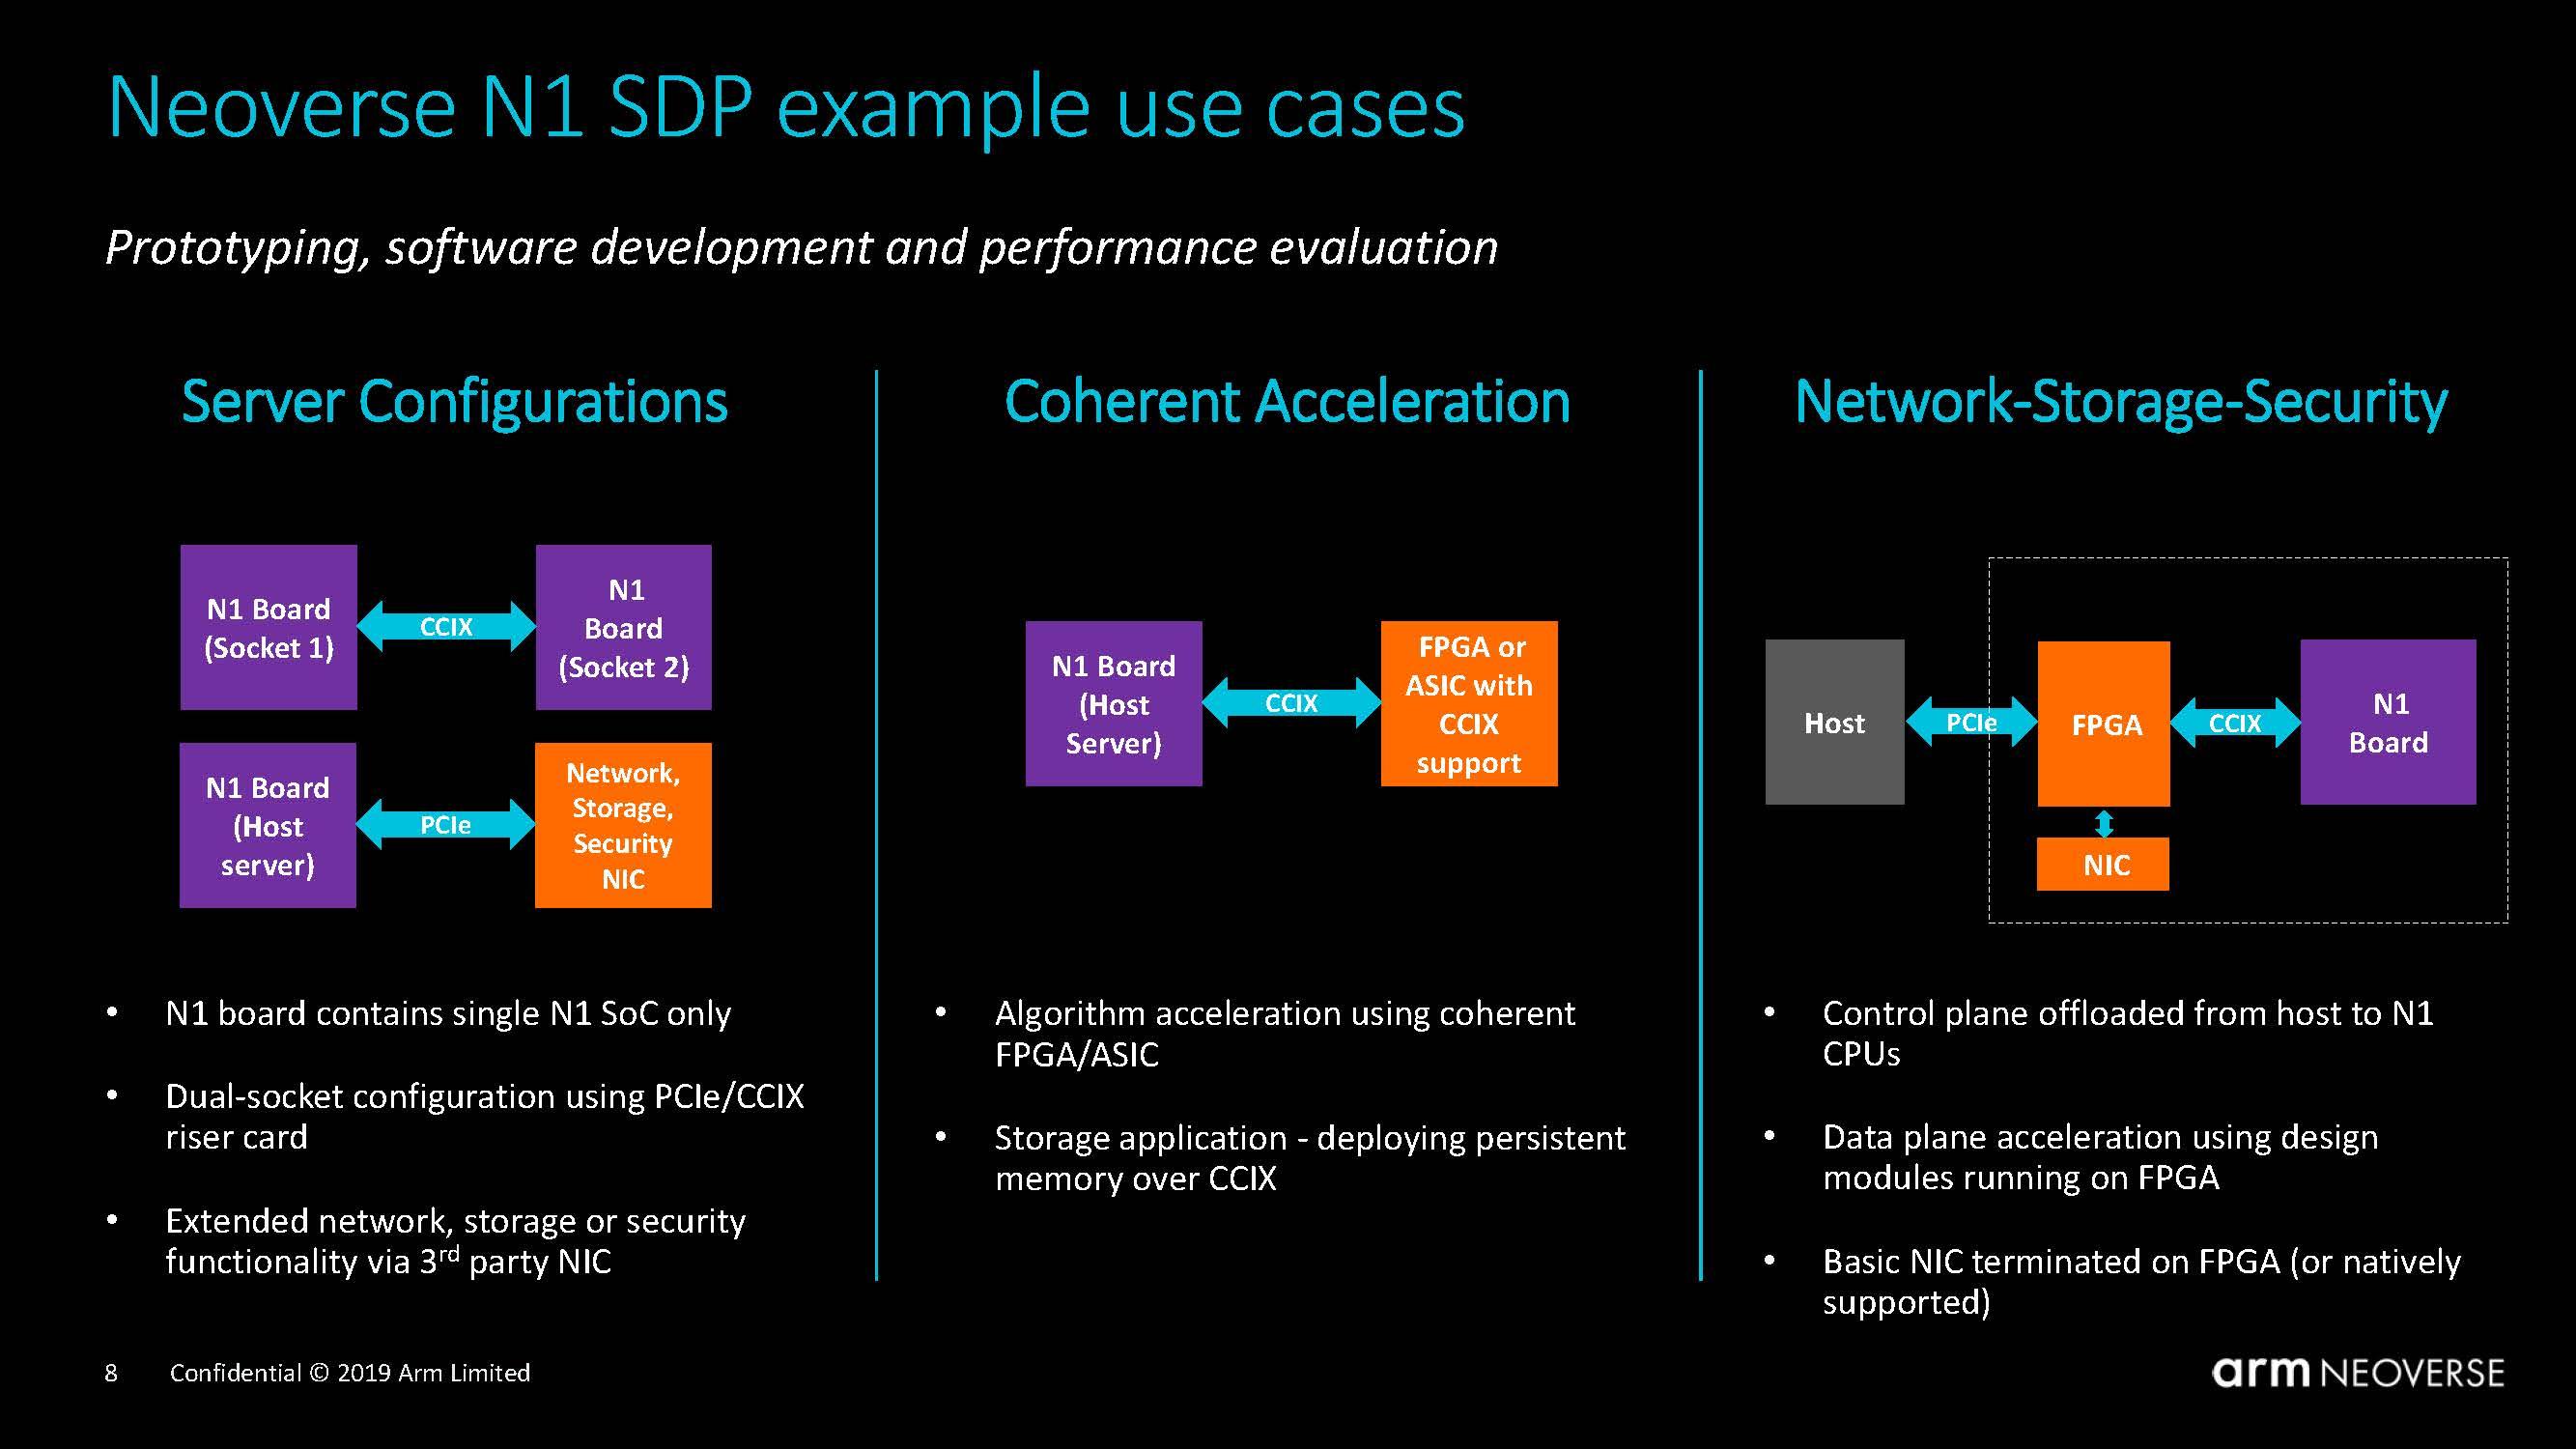 Arm Neoverse N1 System Development Platform Use Cases